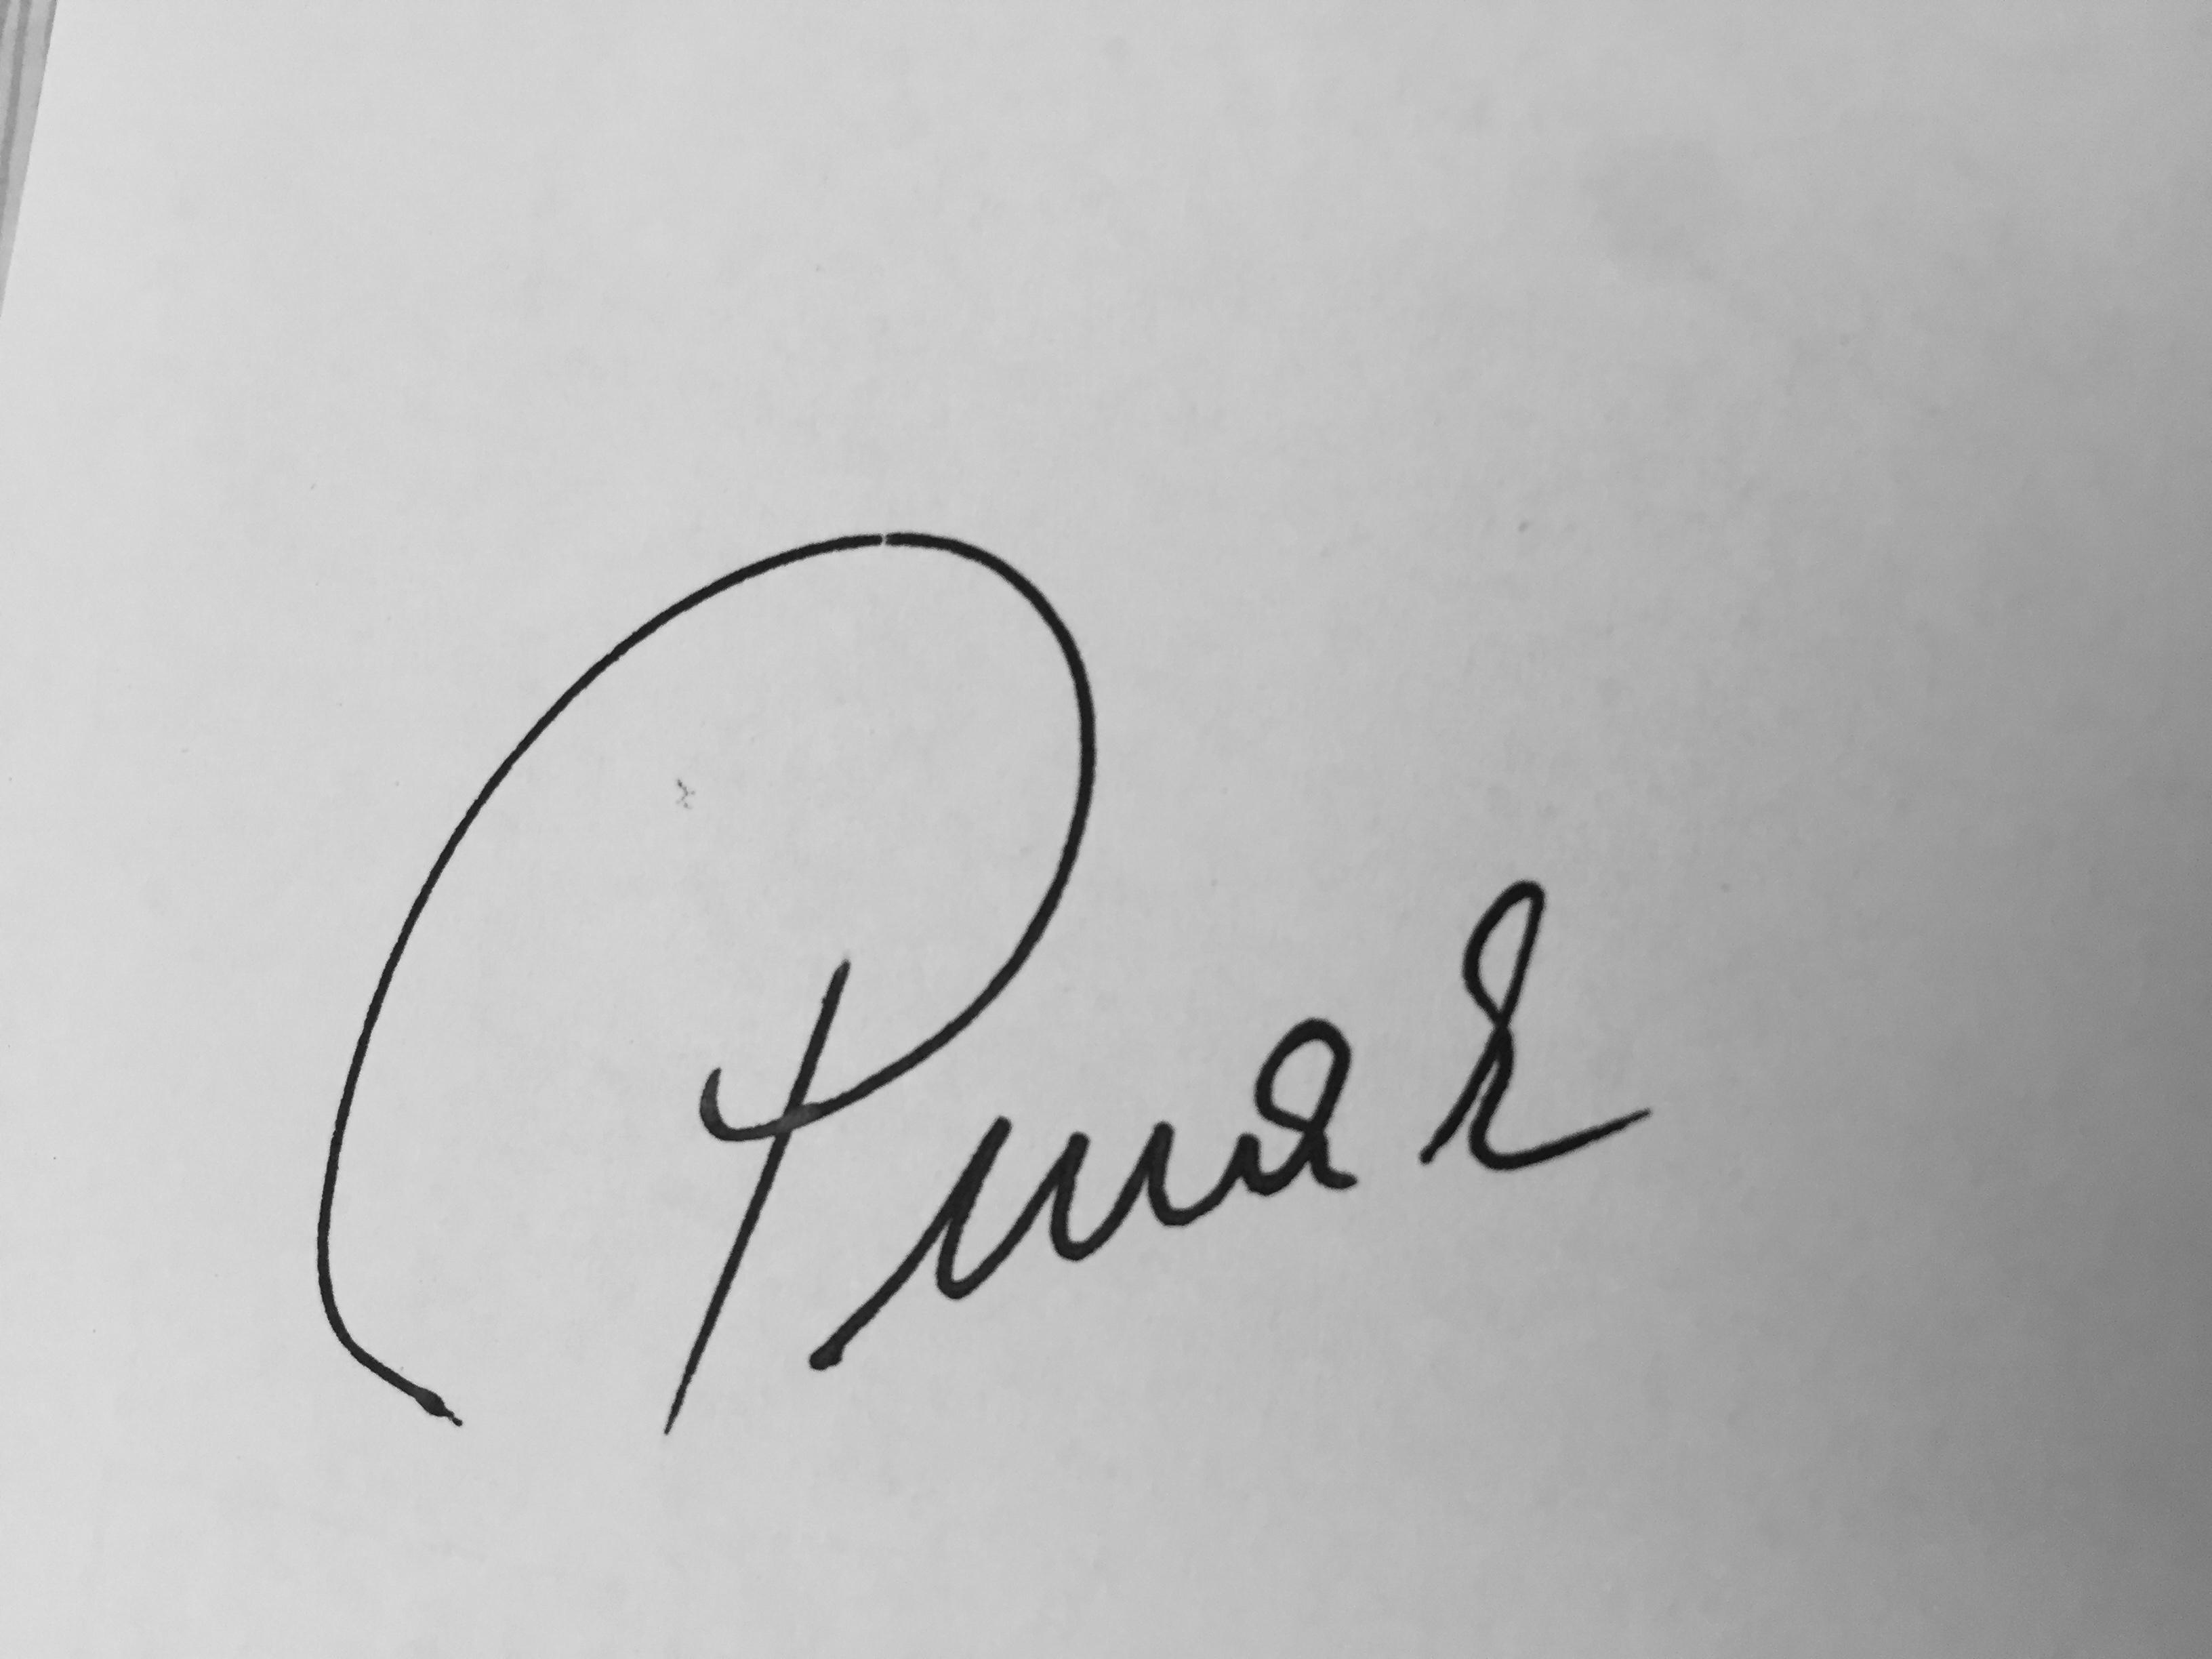 pinar ervardar's Signature